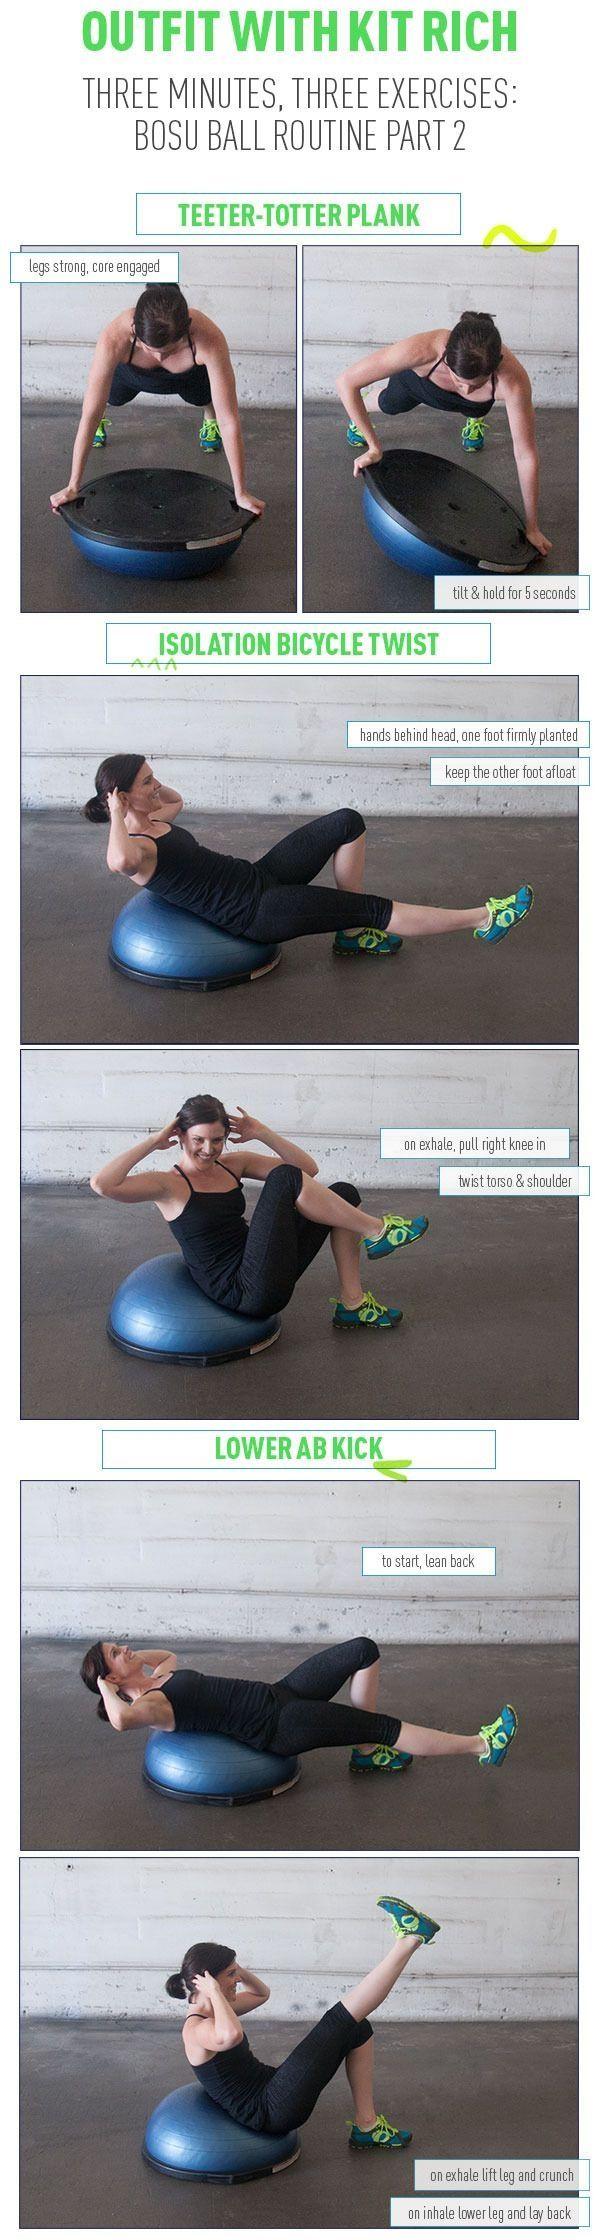 3 Minutes, 3 Bosu Exercises